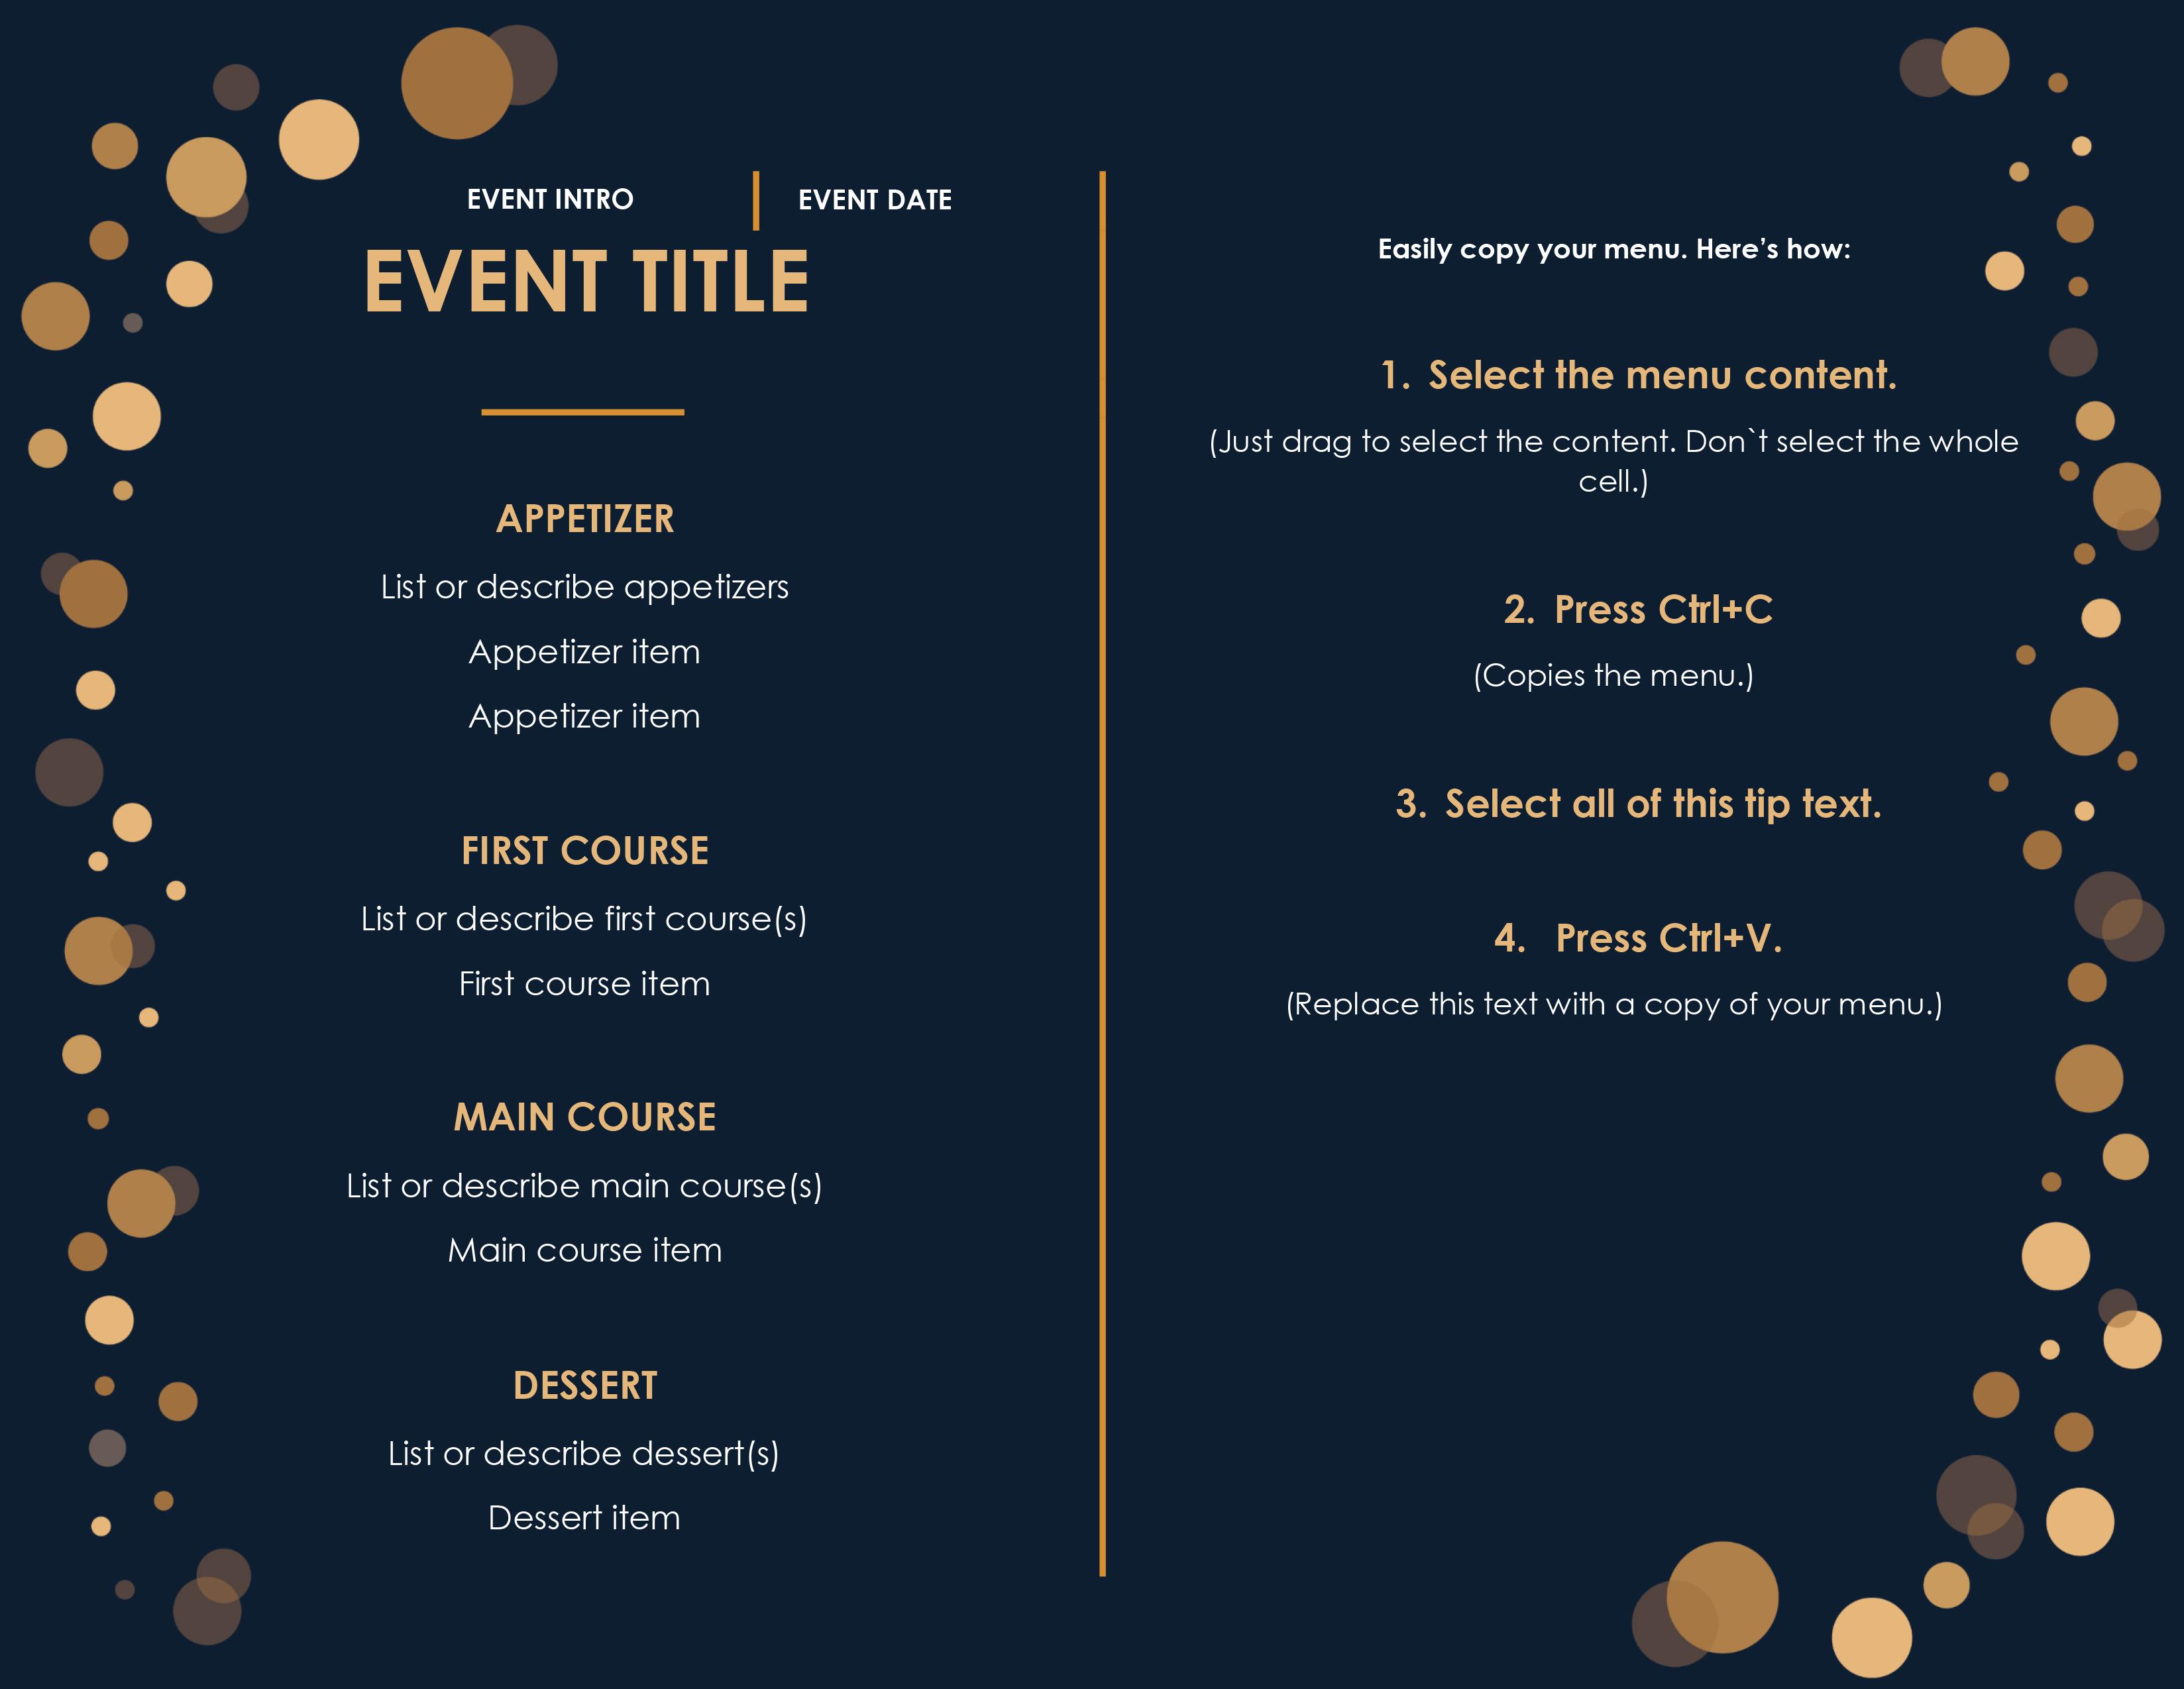 32 free simple menu templates for restaurants cafes and. Black Bedroom Furniture Sets. Home Design Ideas